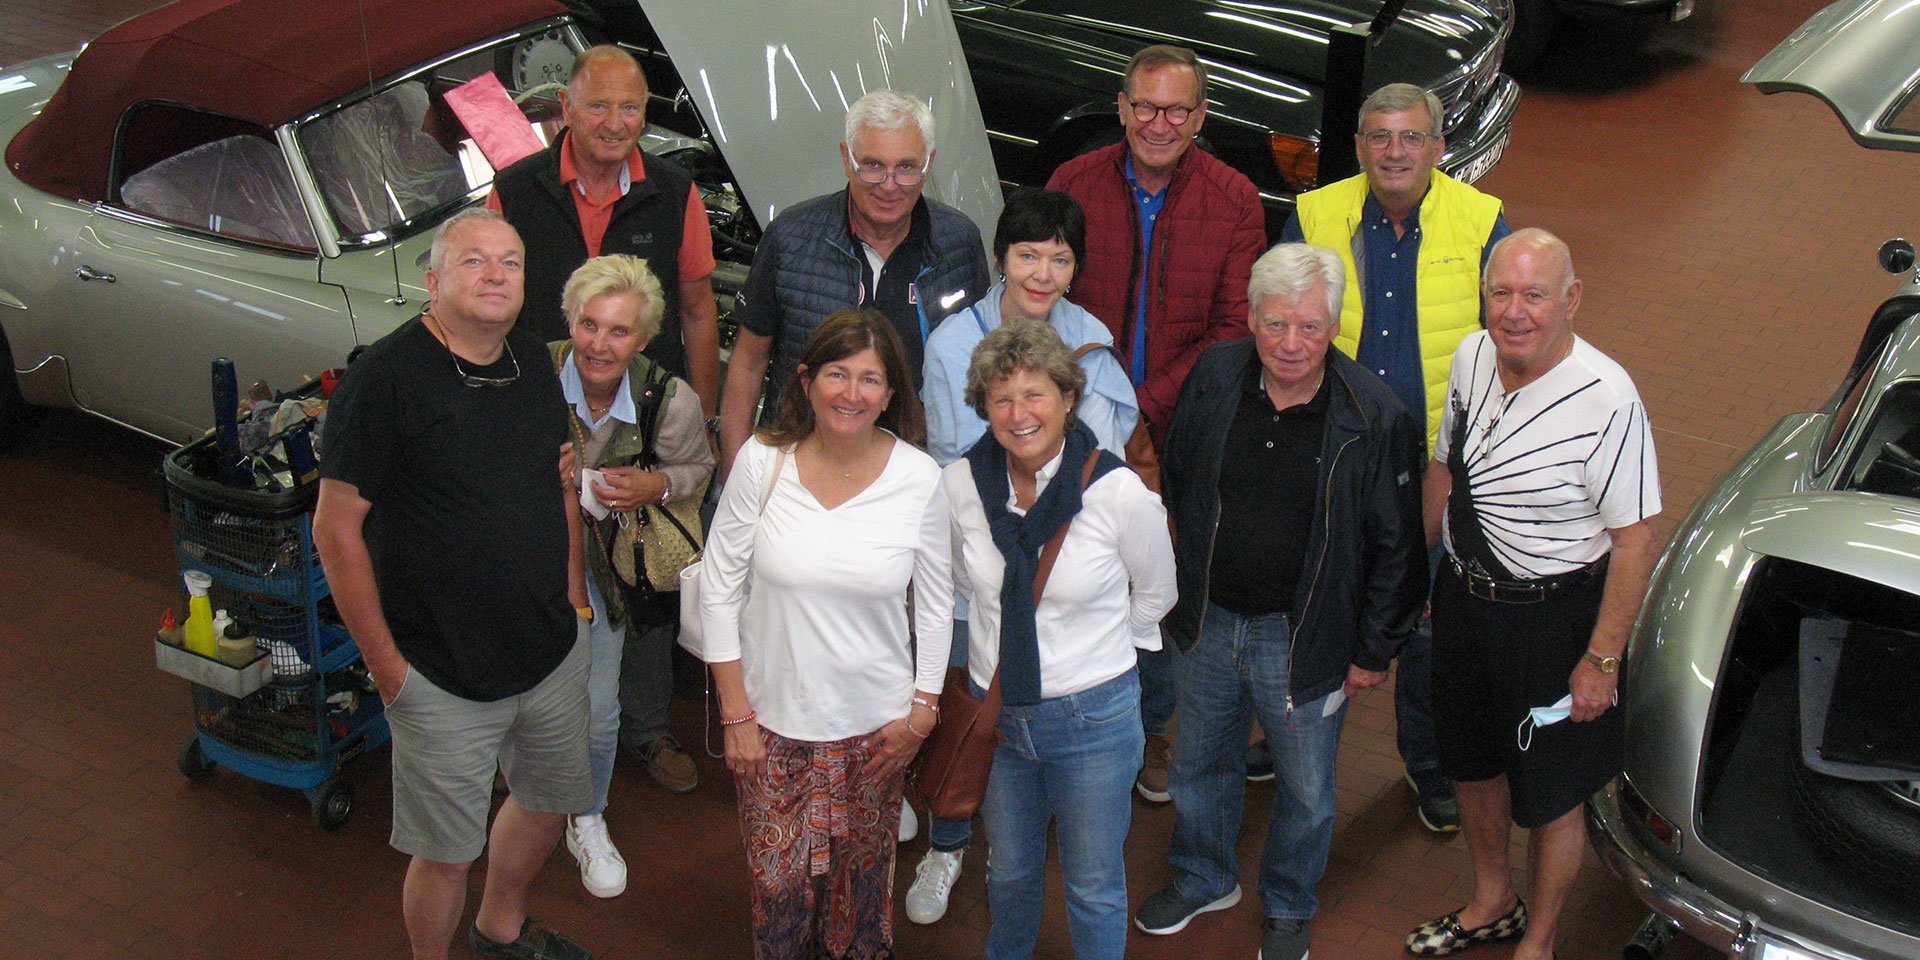 Kienle factory tours – the allure of vintage cars